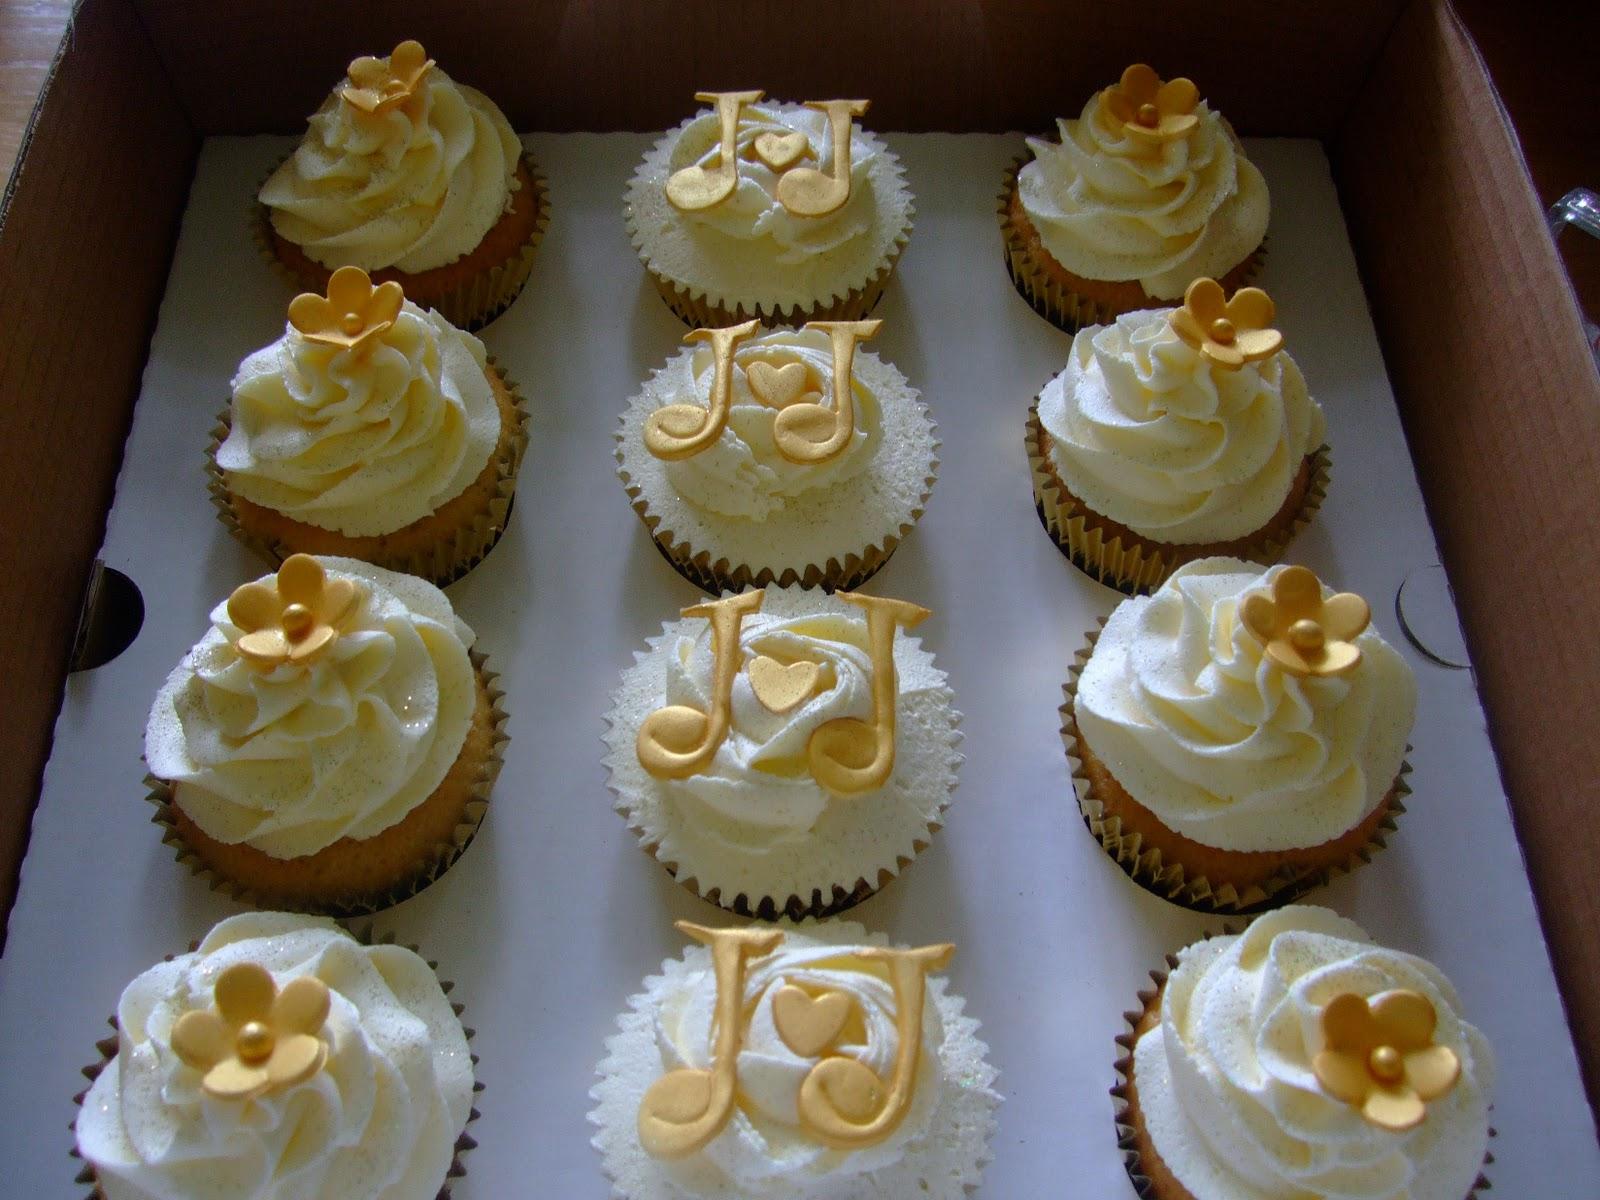 Colourful Cupcakes Of Newbury Golden Wedding Anniversary